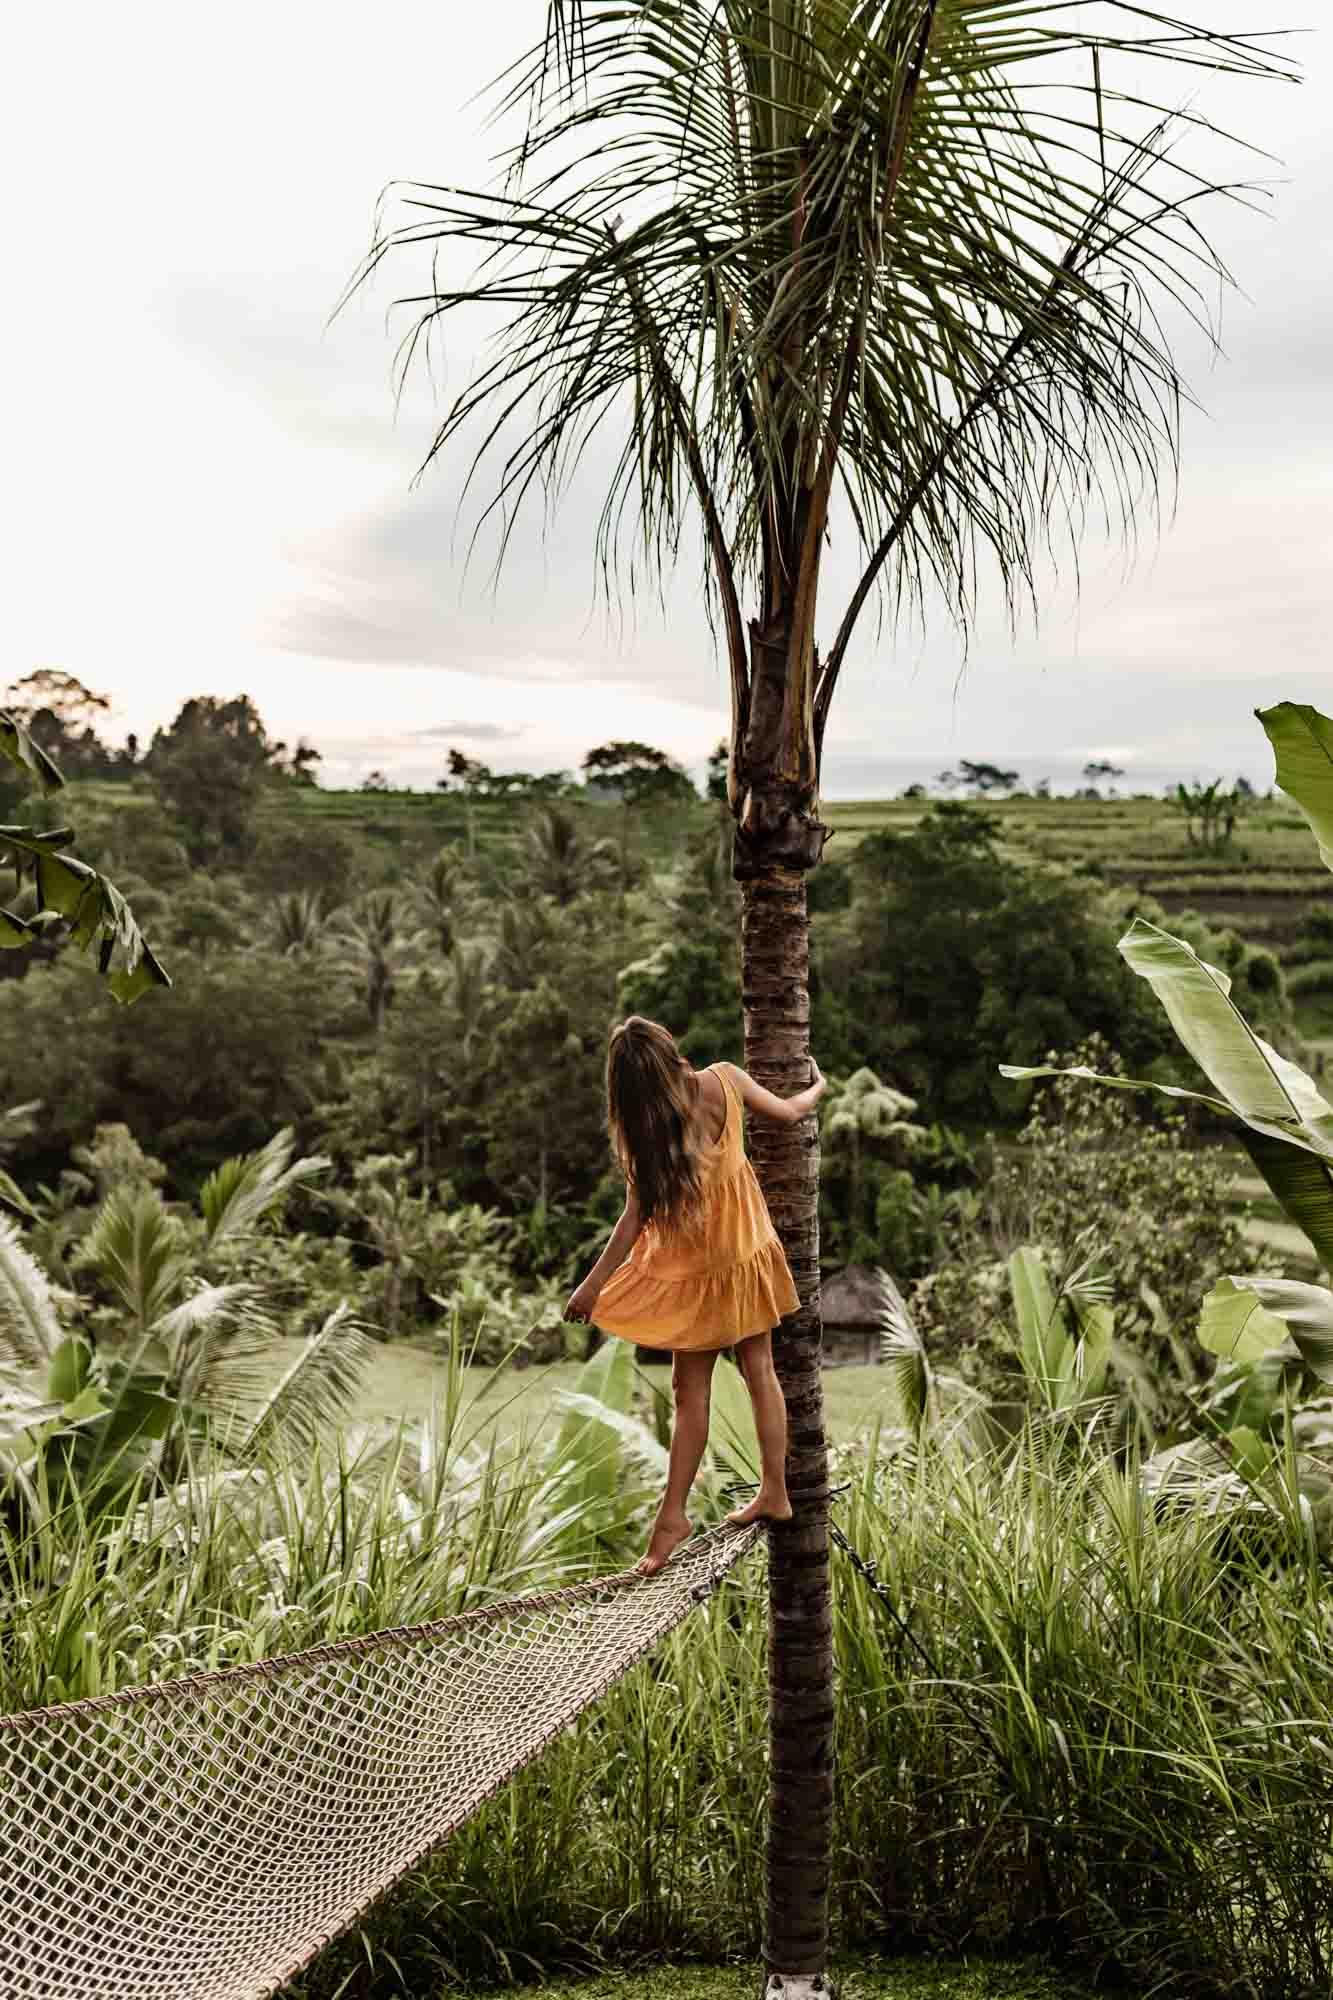 keira-mason-camaya-bali-rove-rainforest-views.jpg